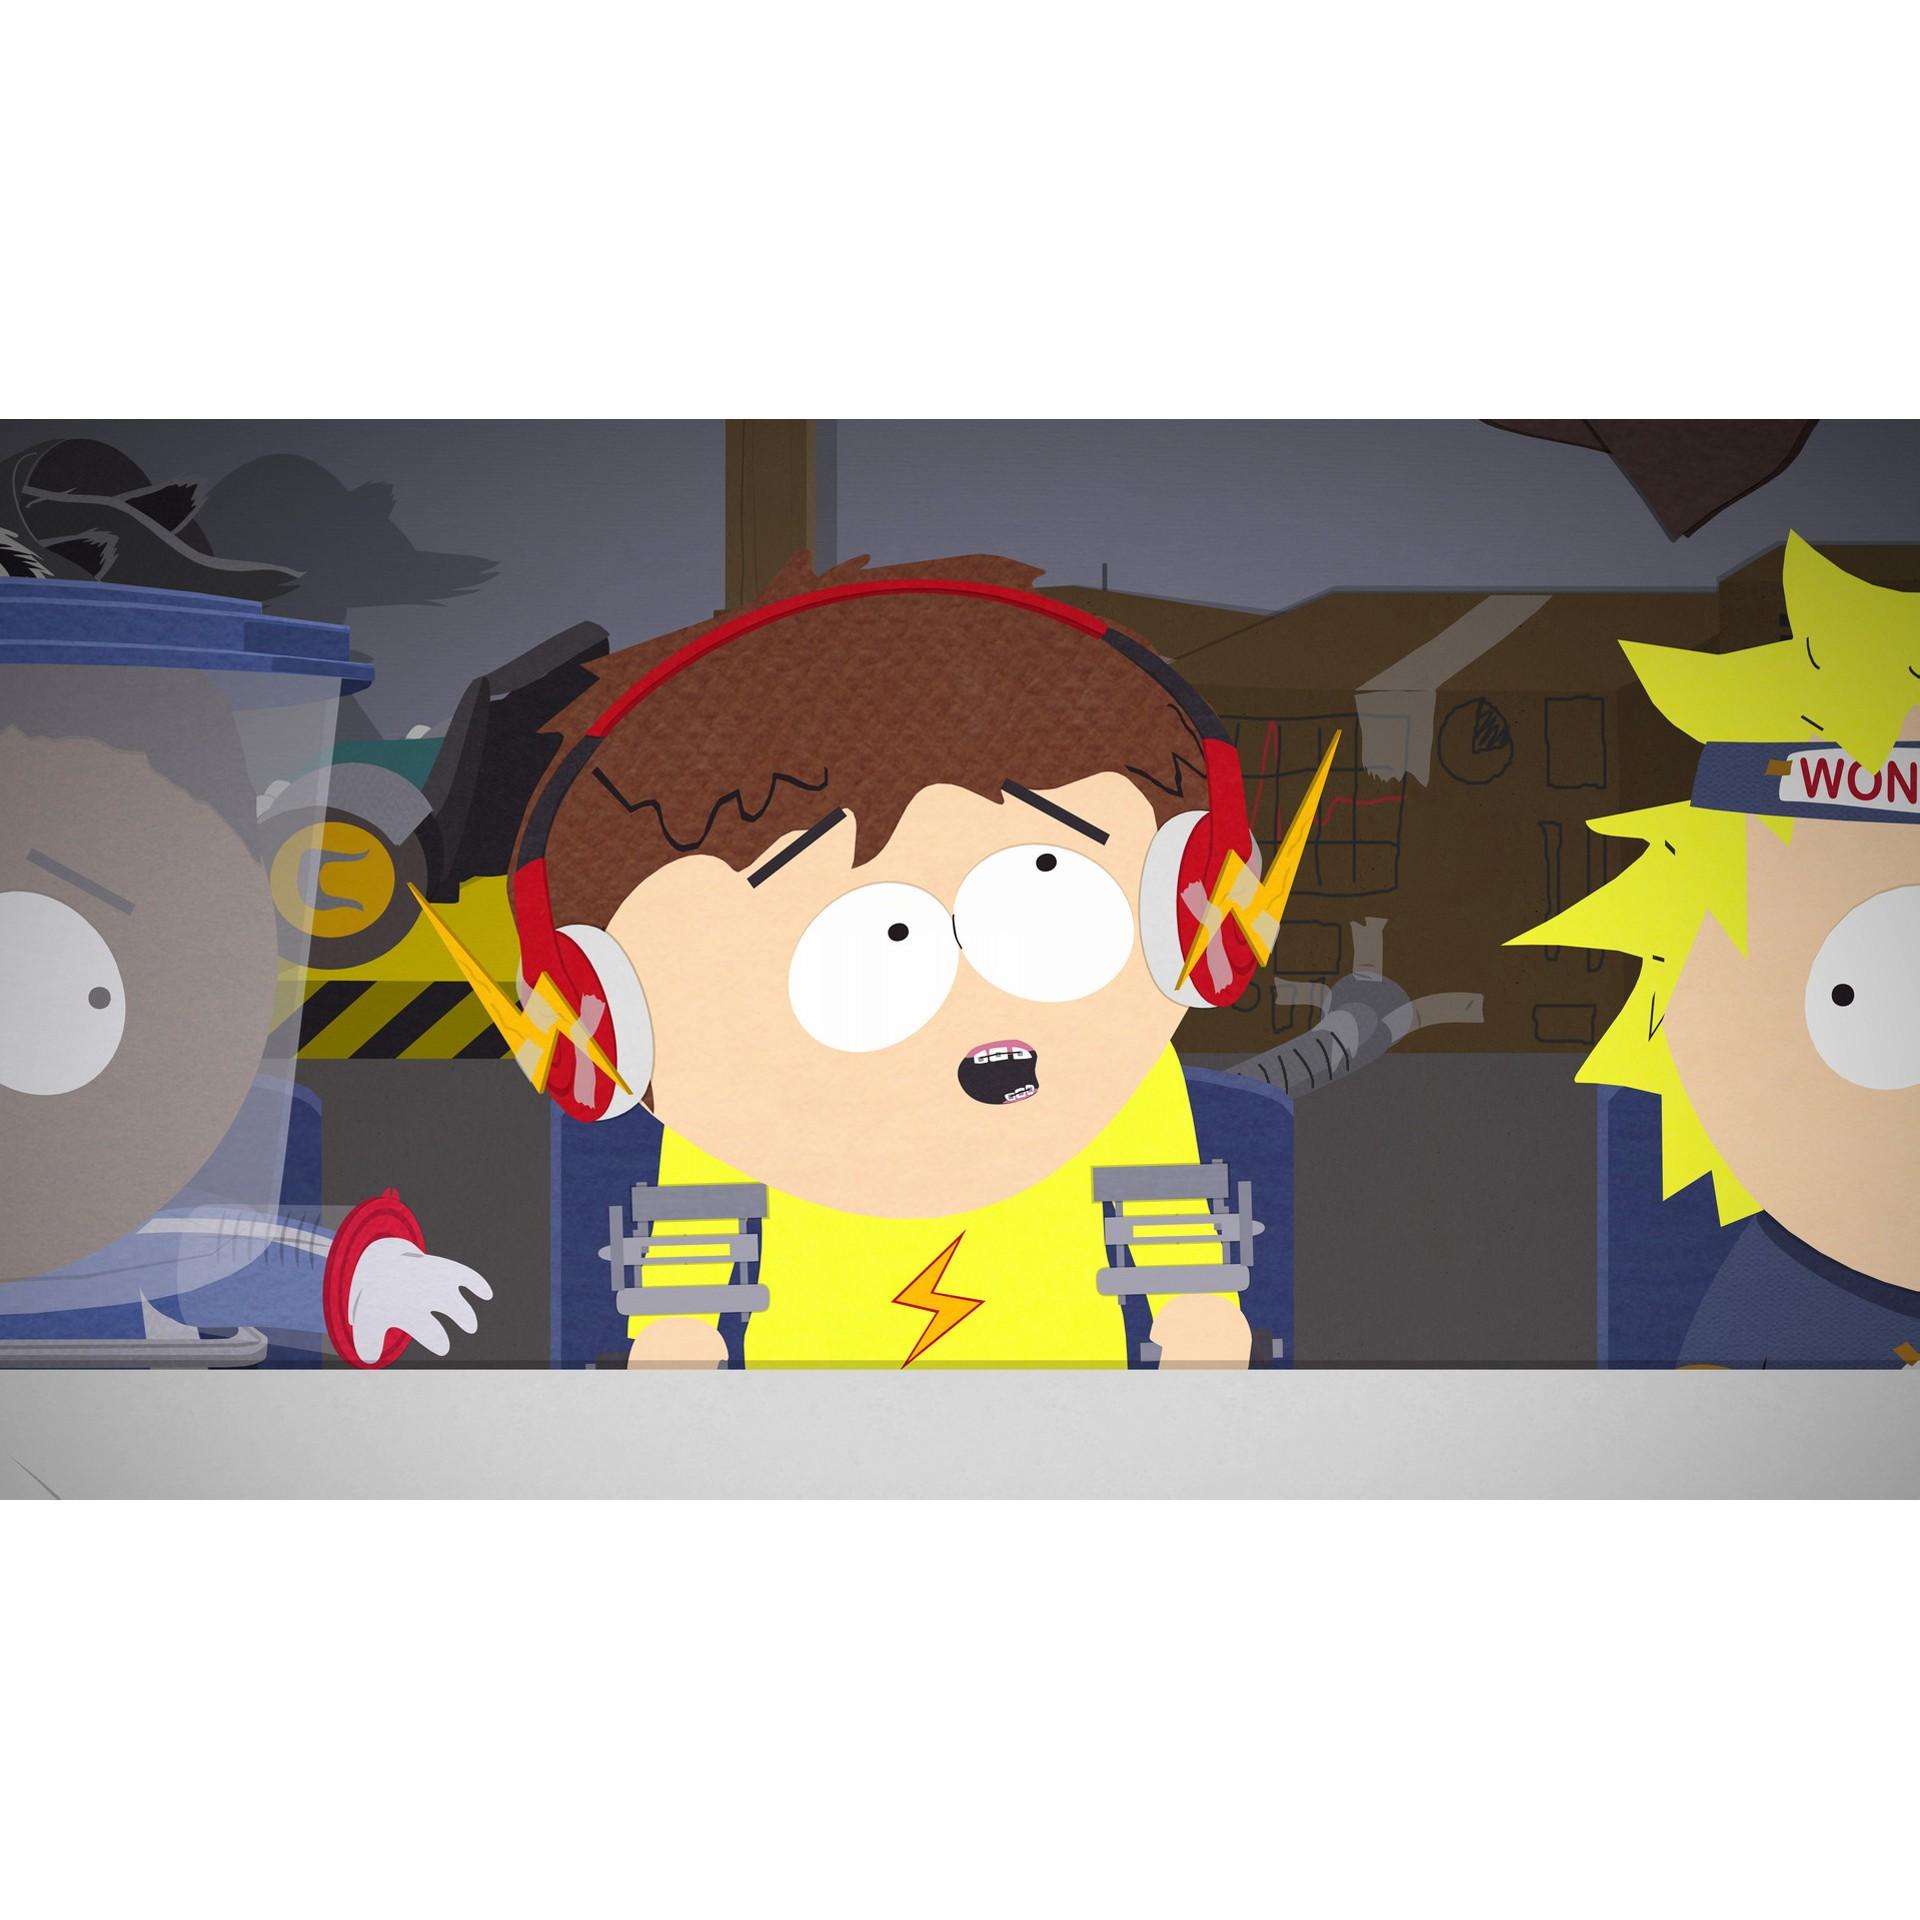 Joc South Park The Fractured But Whole pentru Xbox One 6